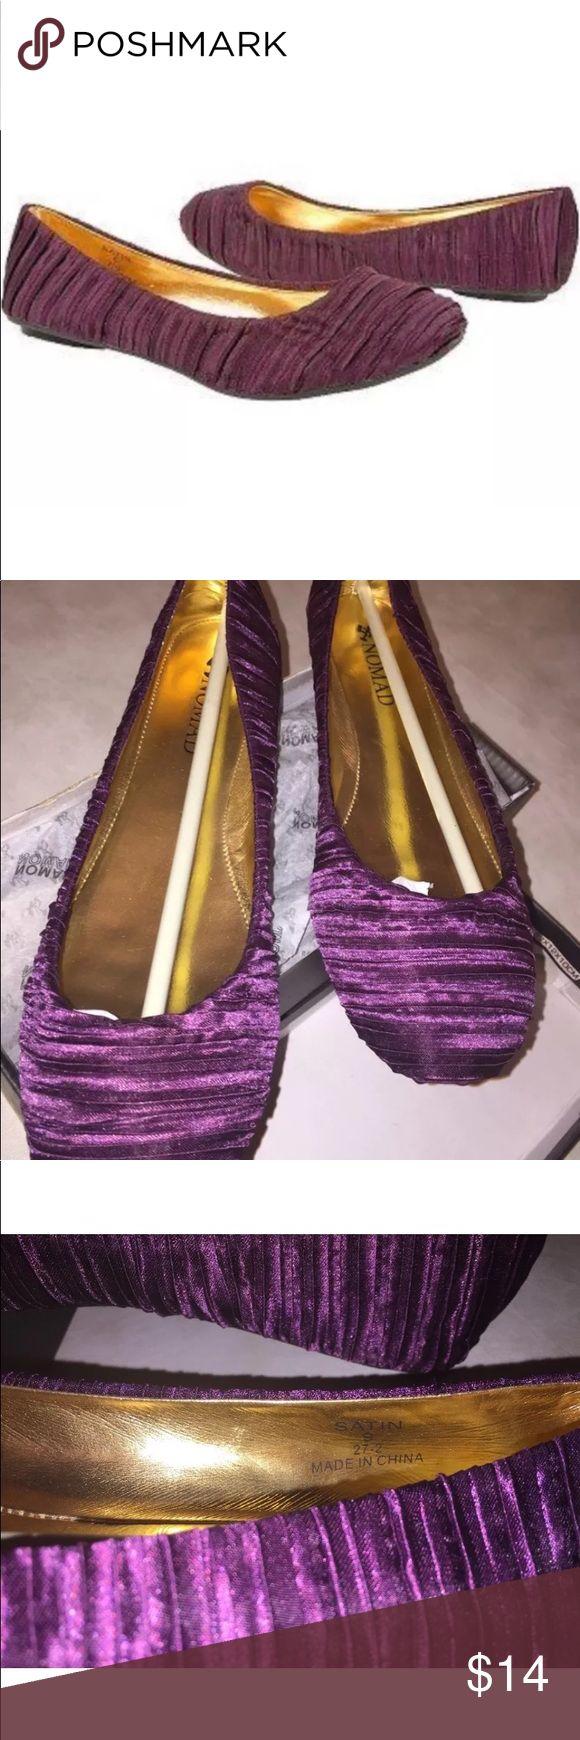 Nomad size 9 purple Satin Ballet flats NIB purple flats Nomad Footwear Shoes Flats & Loafers